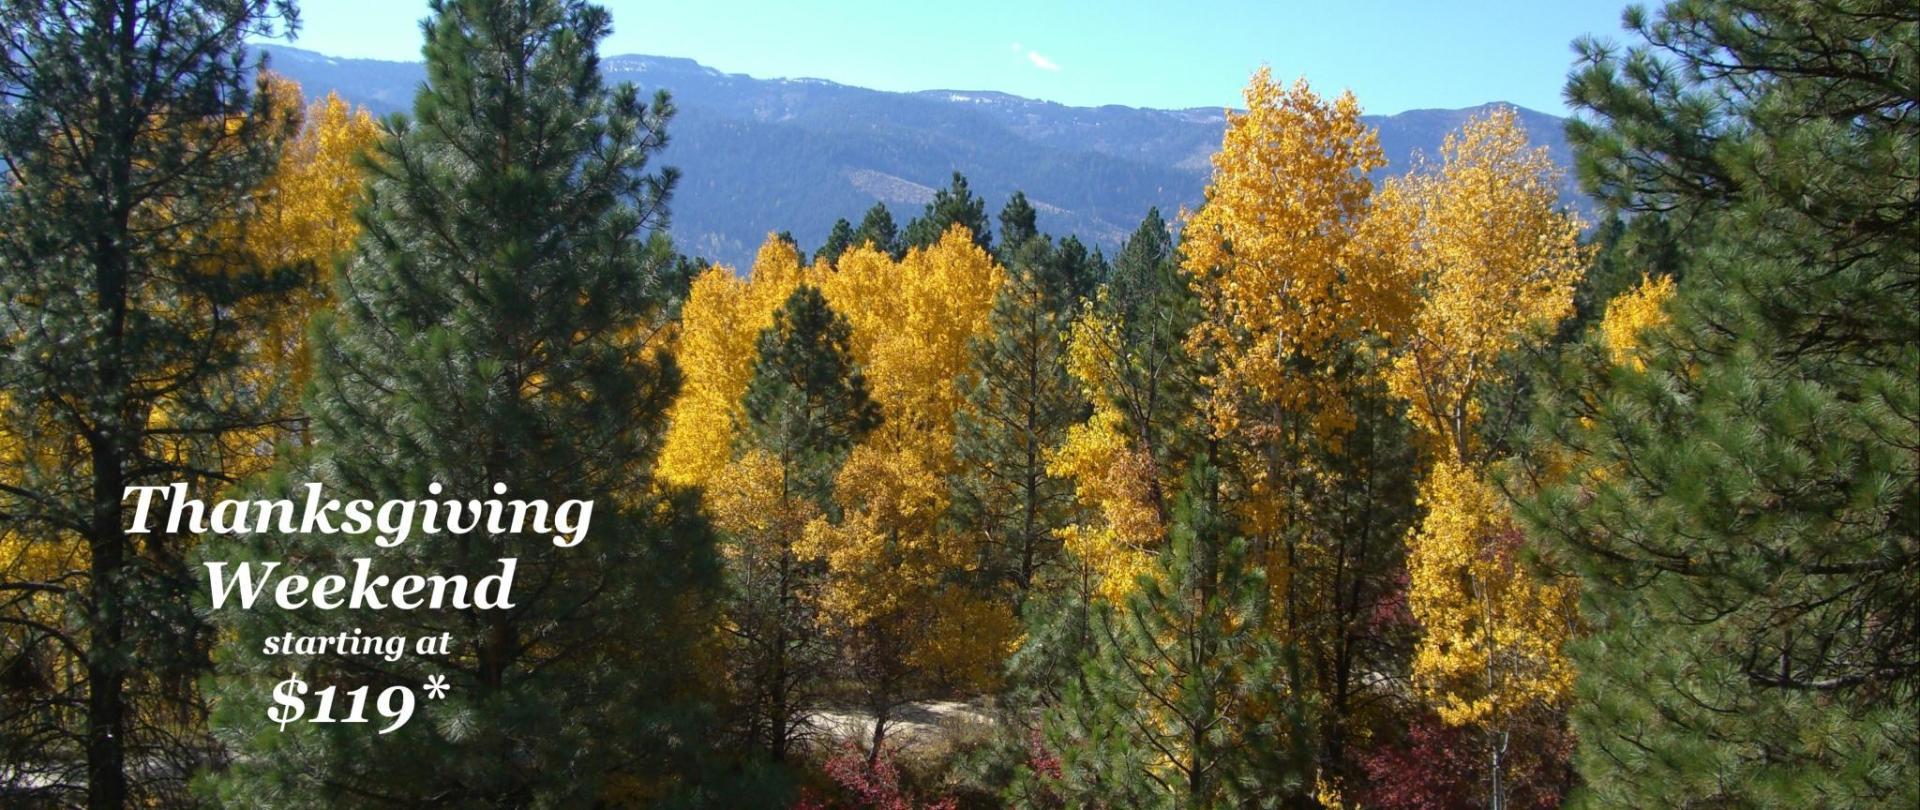 Fall-Forest-119.jpg